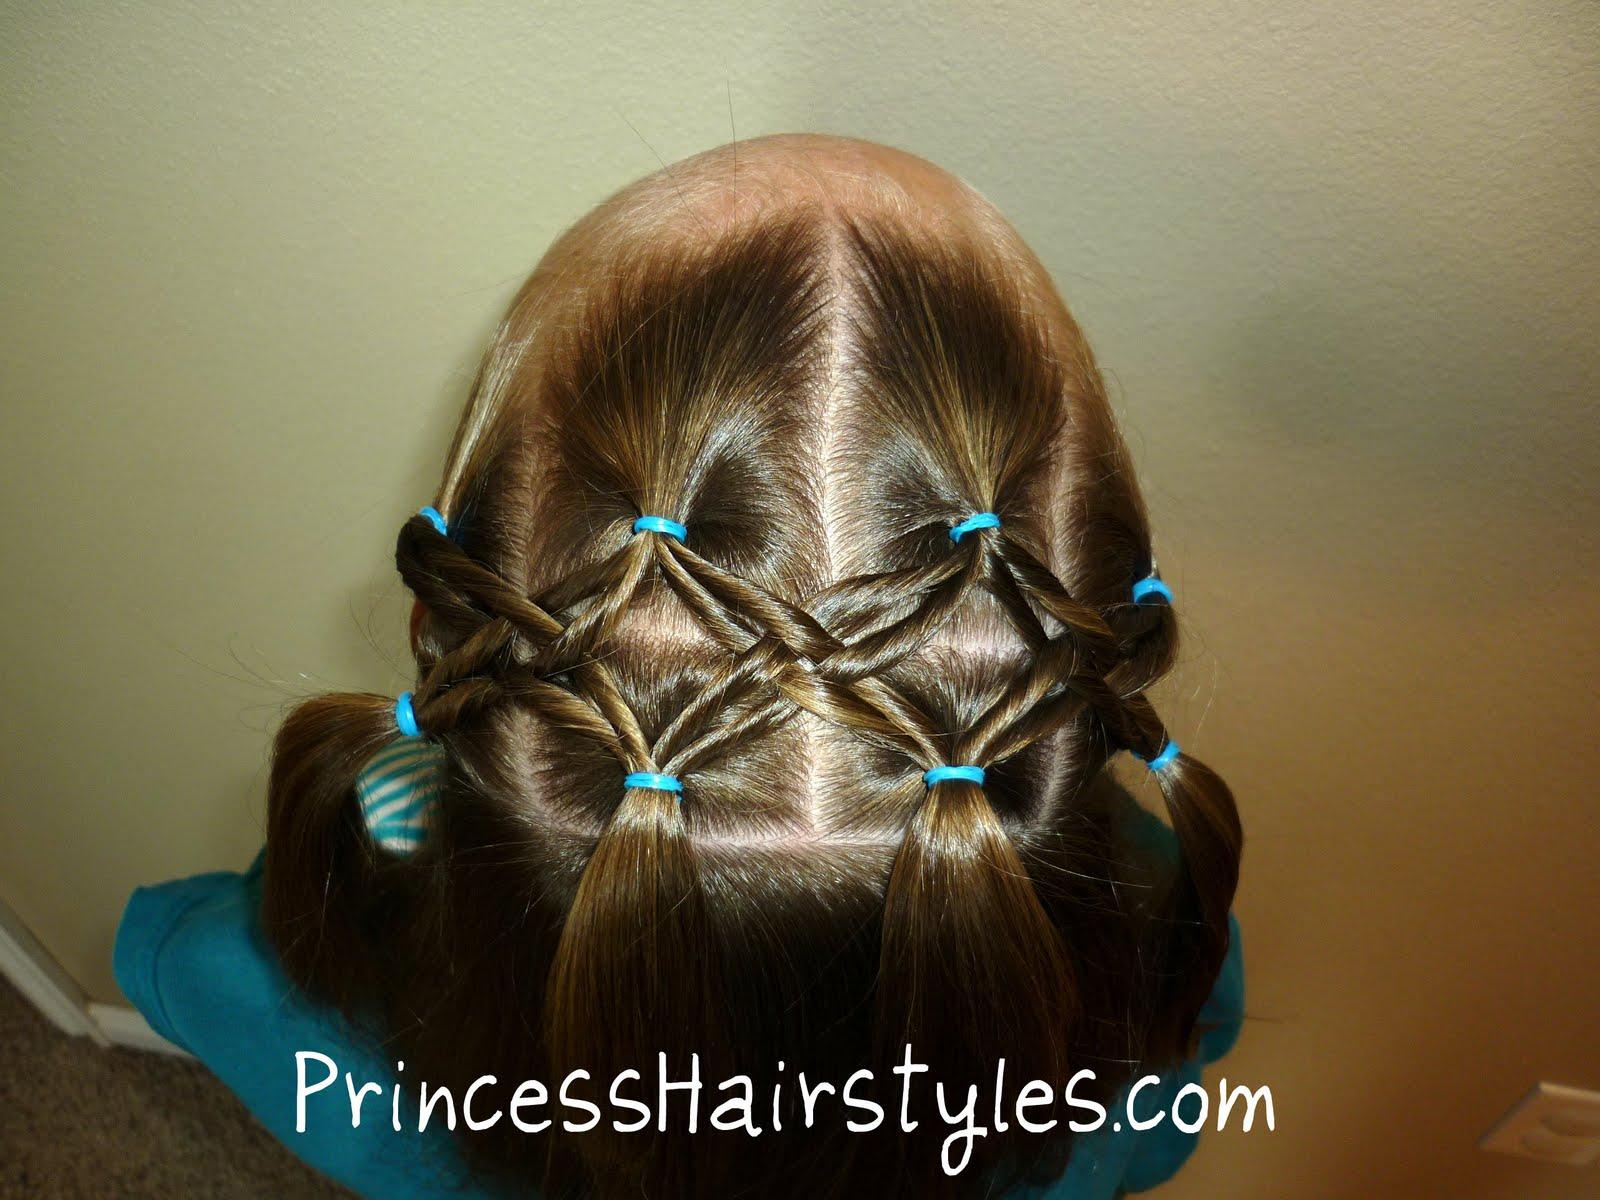 Terrific Woven Hair Headband Hairstyles For Girls Princess Hairstyles Short Hairstyles Gunalazisus